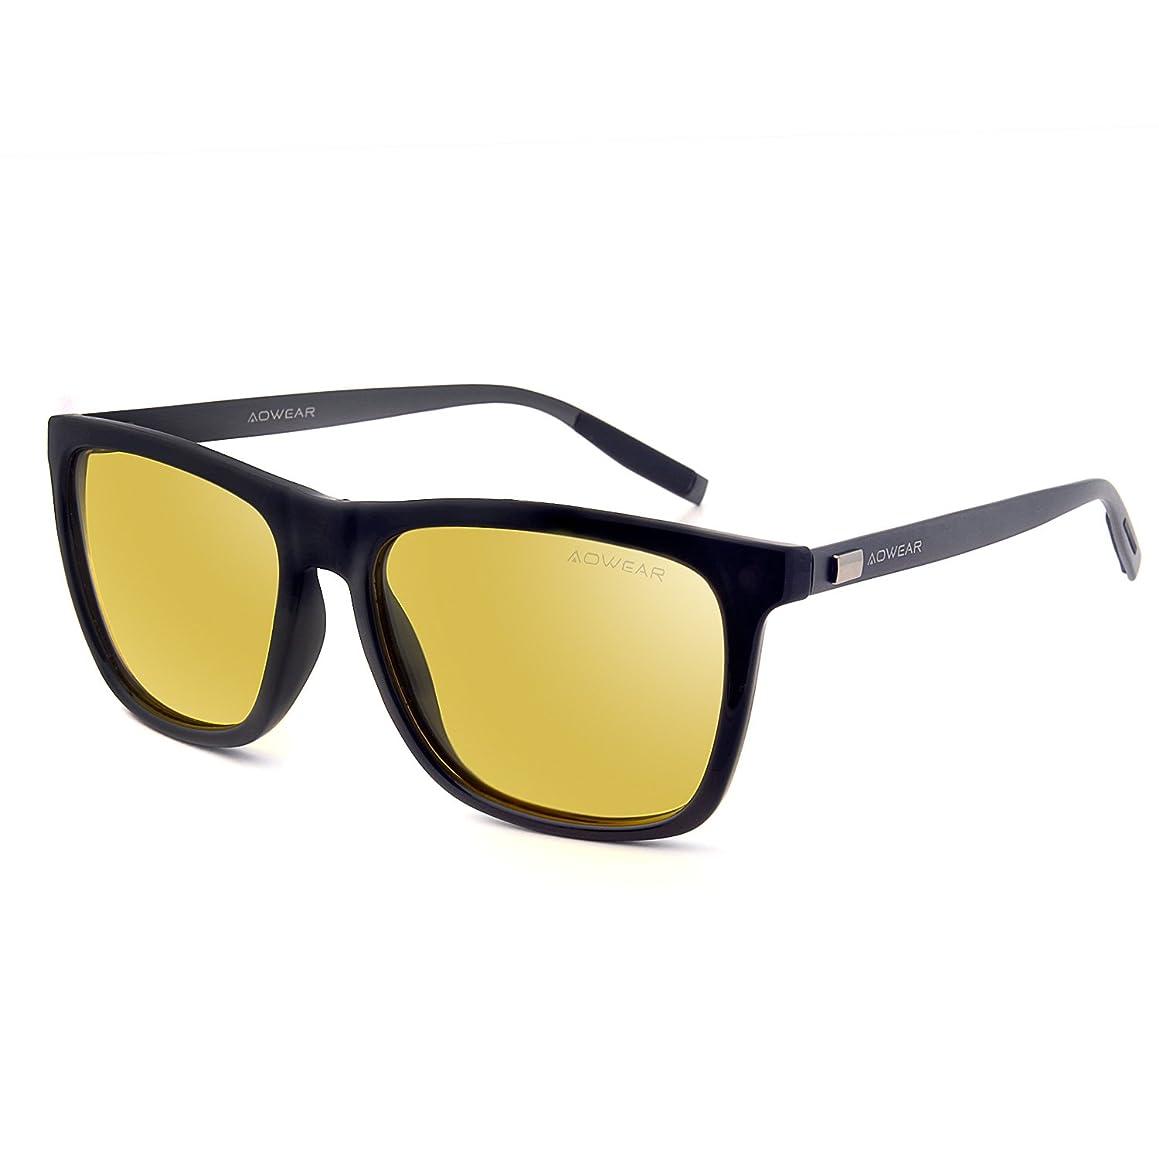 AOWEAR Square Night Vision Glasses for Night Driving Unisex HD UV400 Anti-glare Yellow Polarized Sunglasses for Men Women